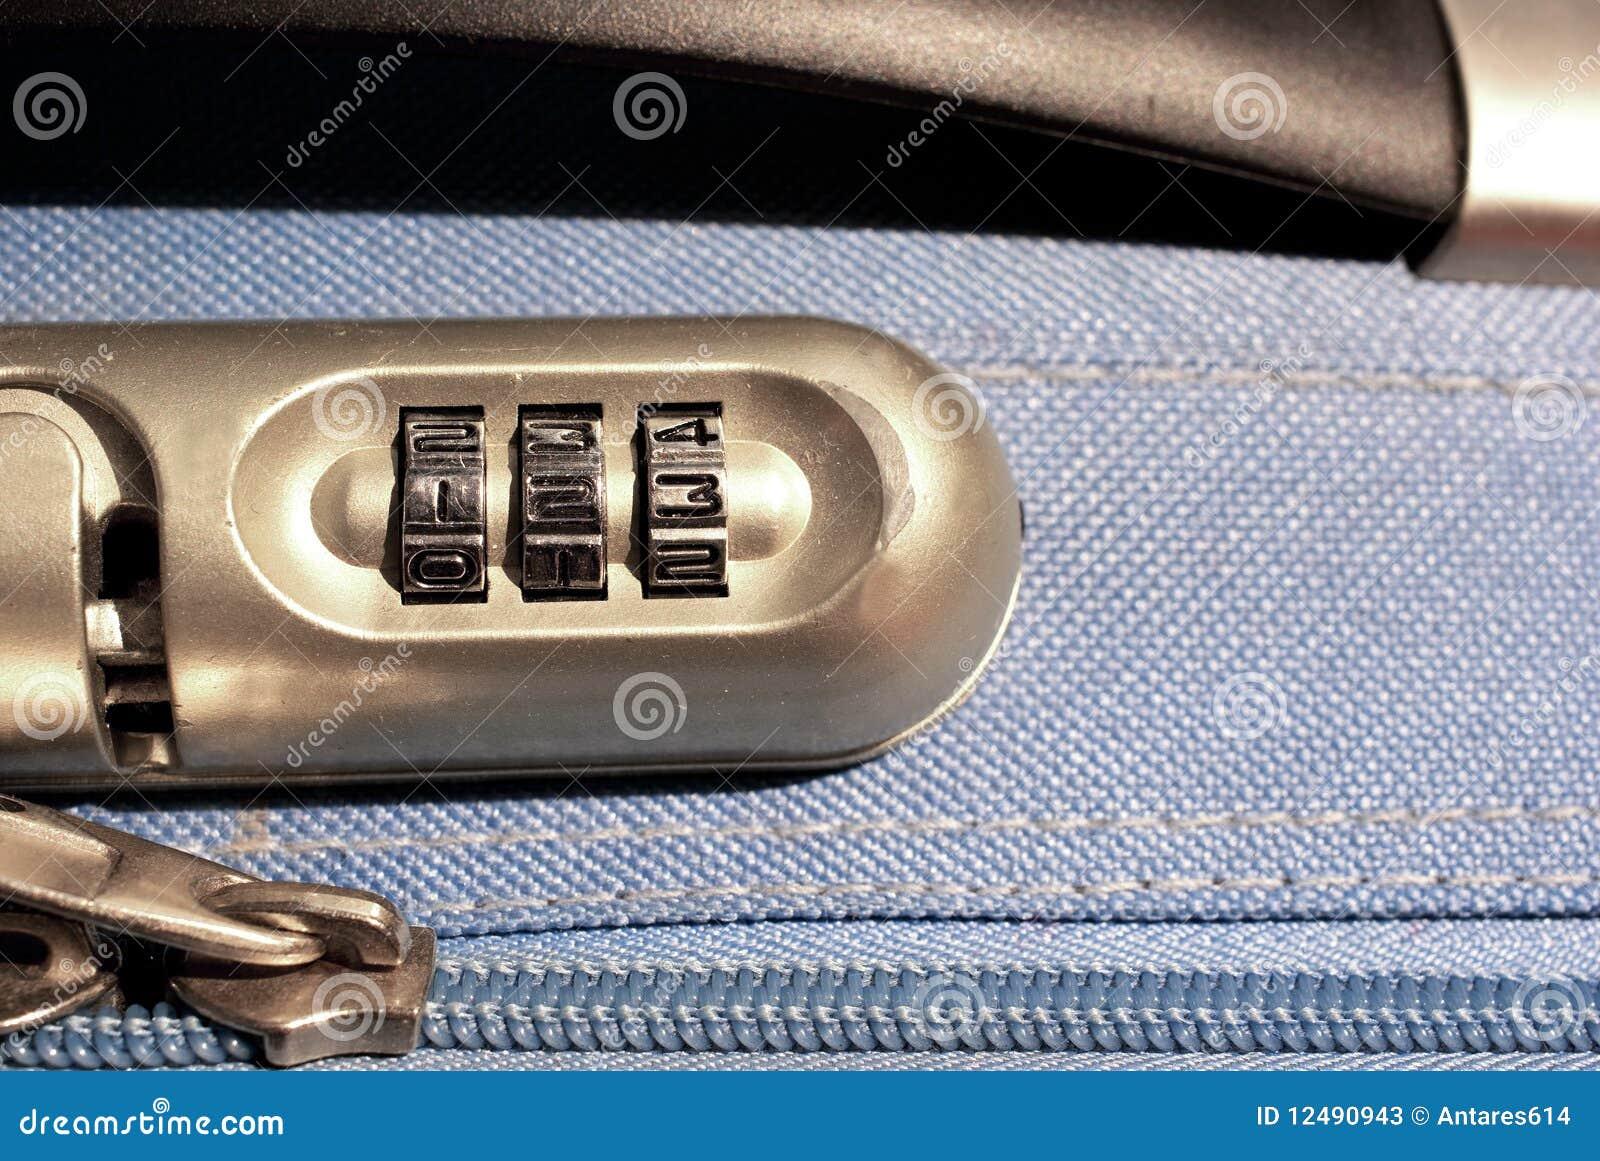 Cifra del equipaje